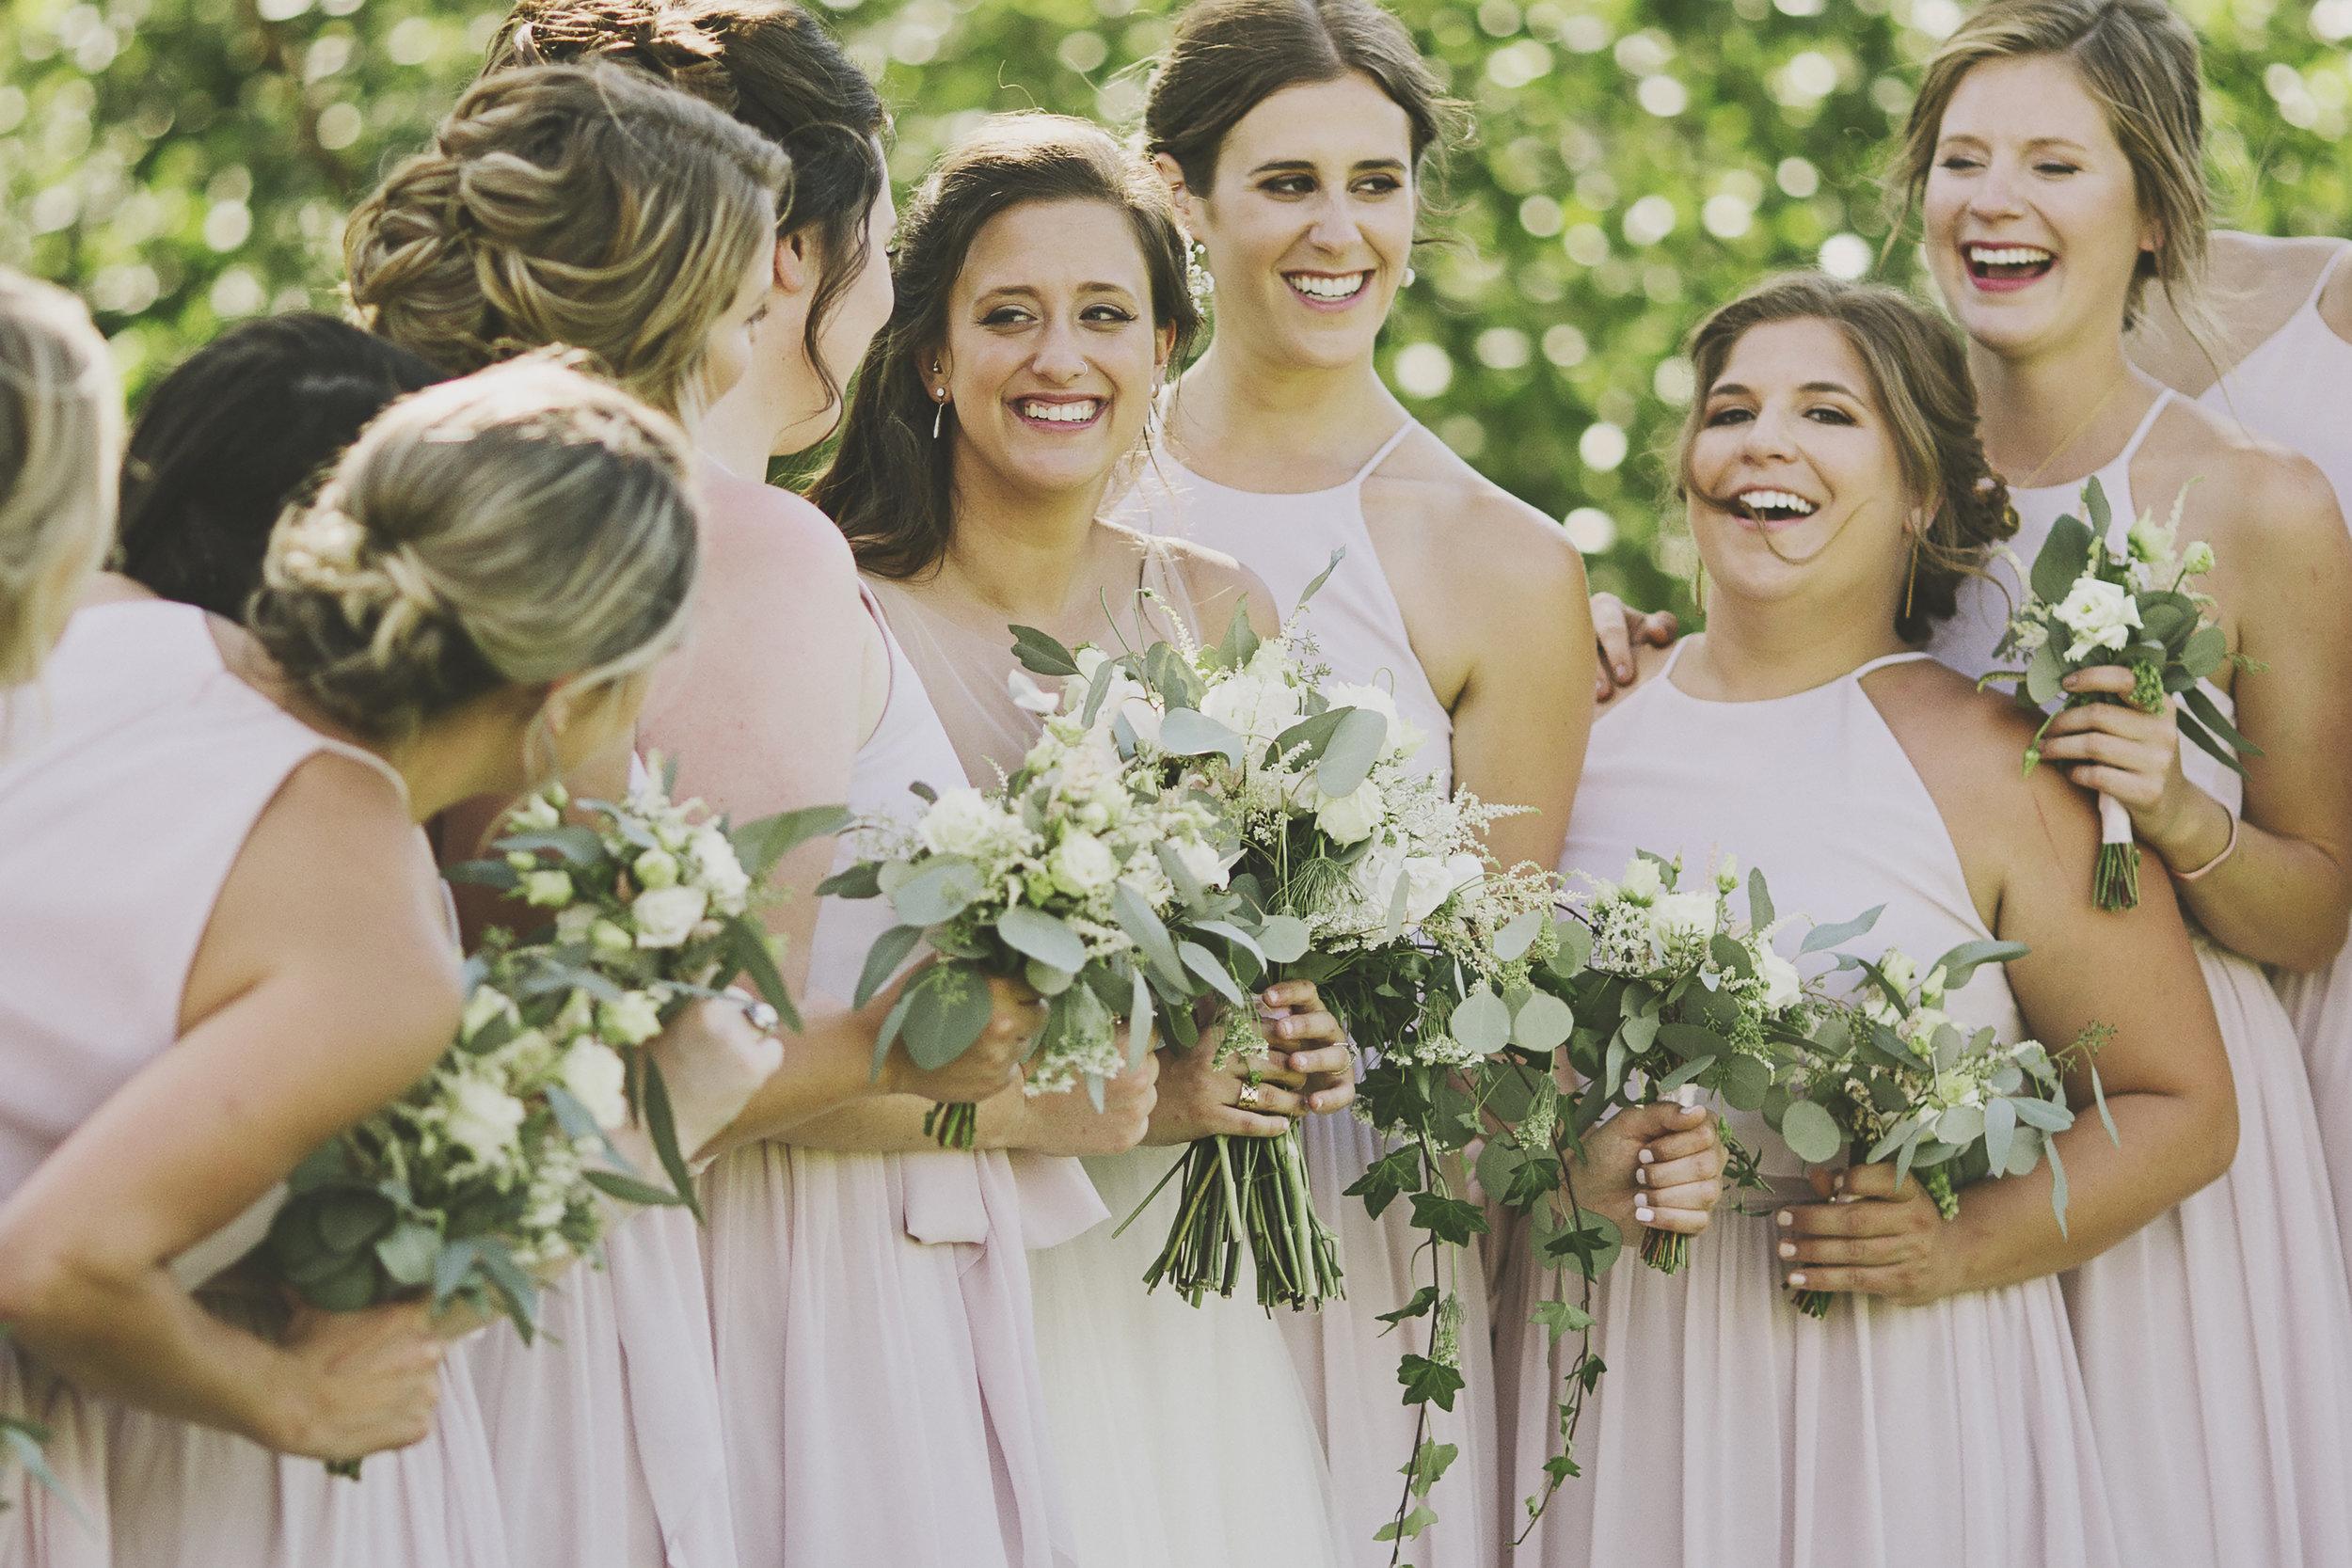 Chloe Hurwitz + Kiefer Martin Wedding_Grey Wolf Ranch_Kelsey Lane Photography4976 copy.jpg